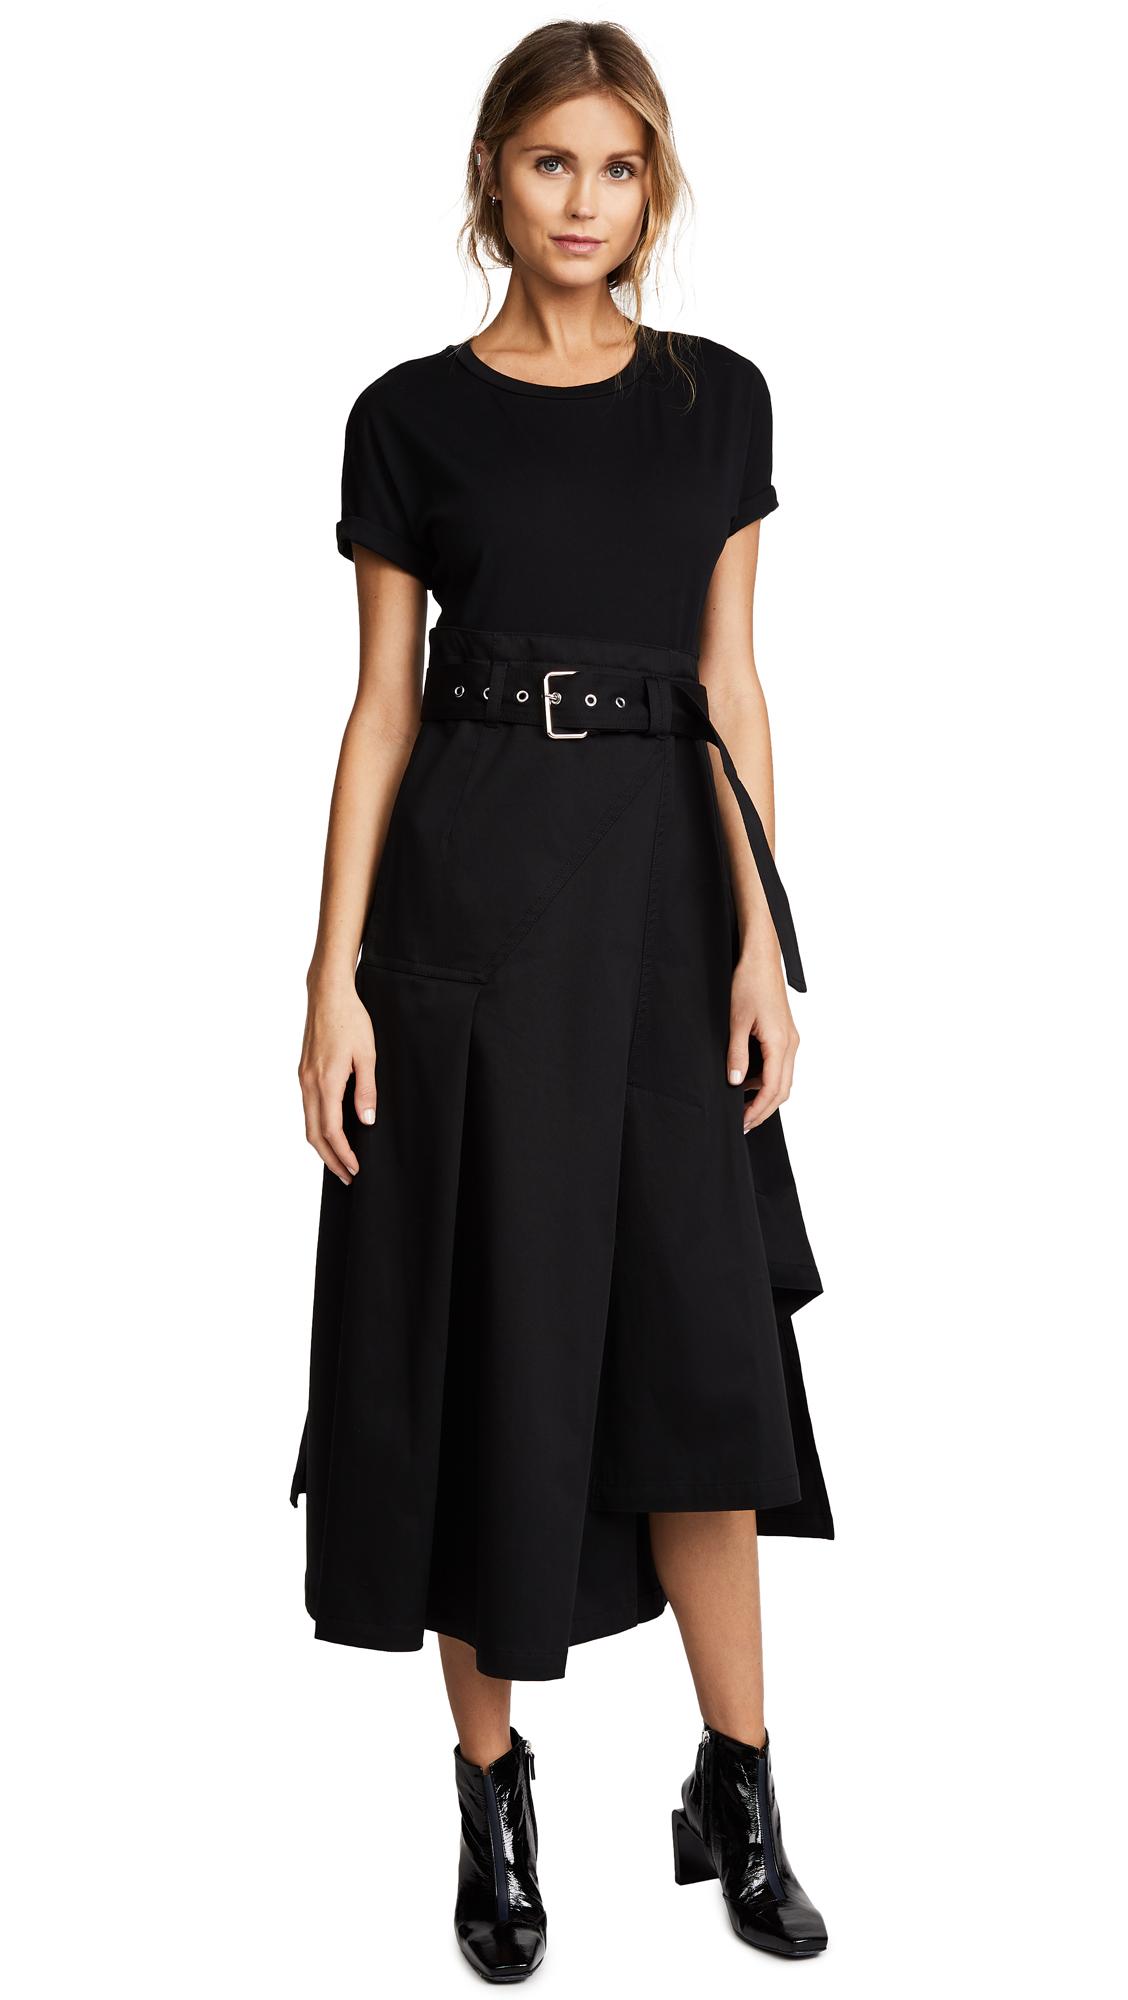 3.1 Phillip Lim Tee Top Dress